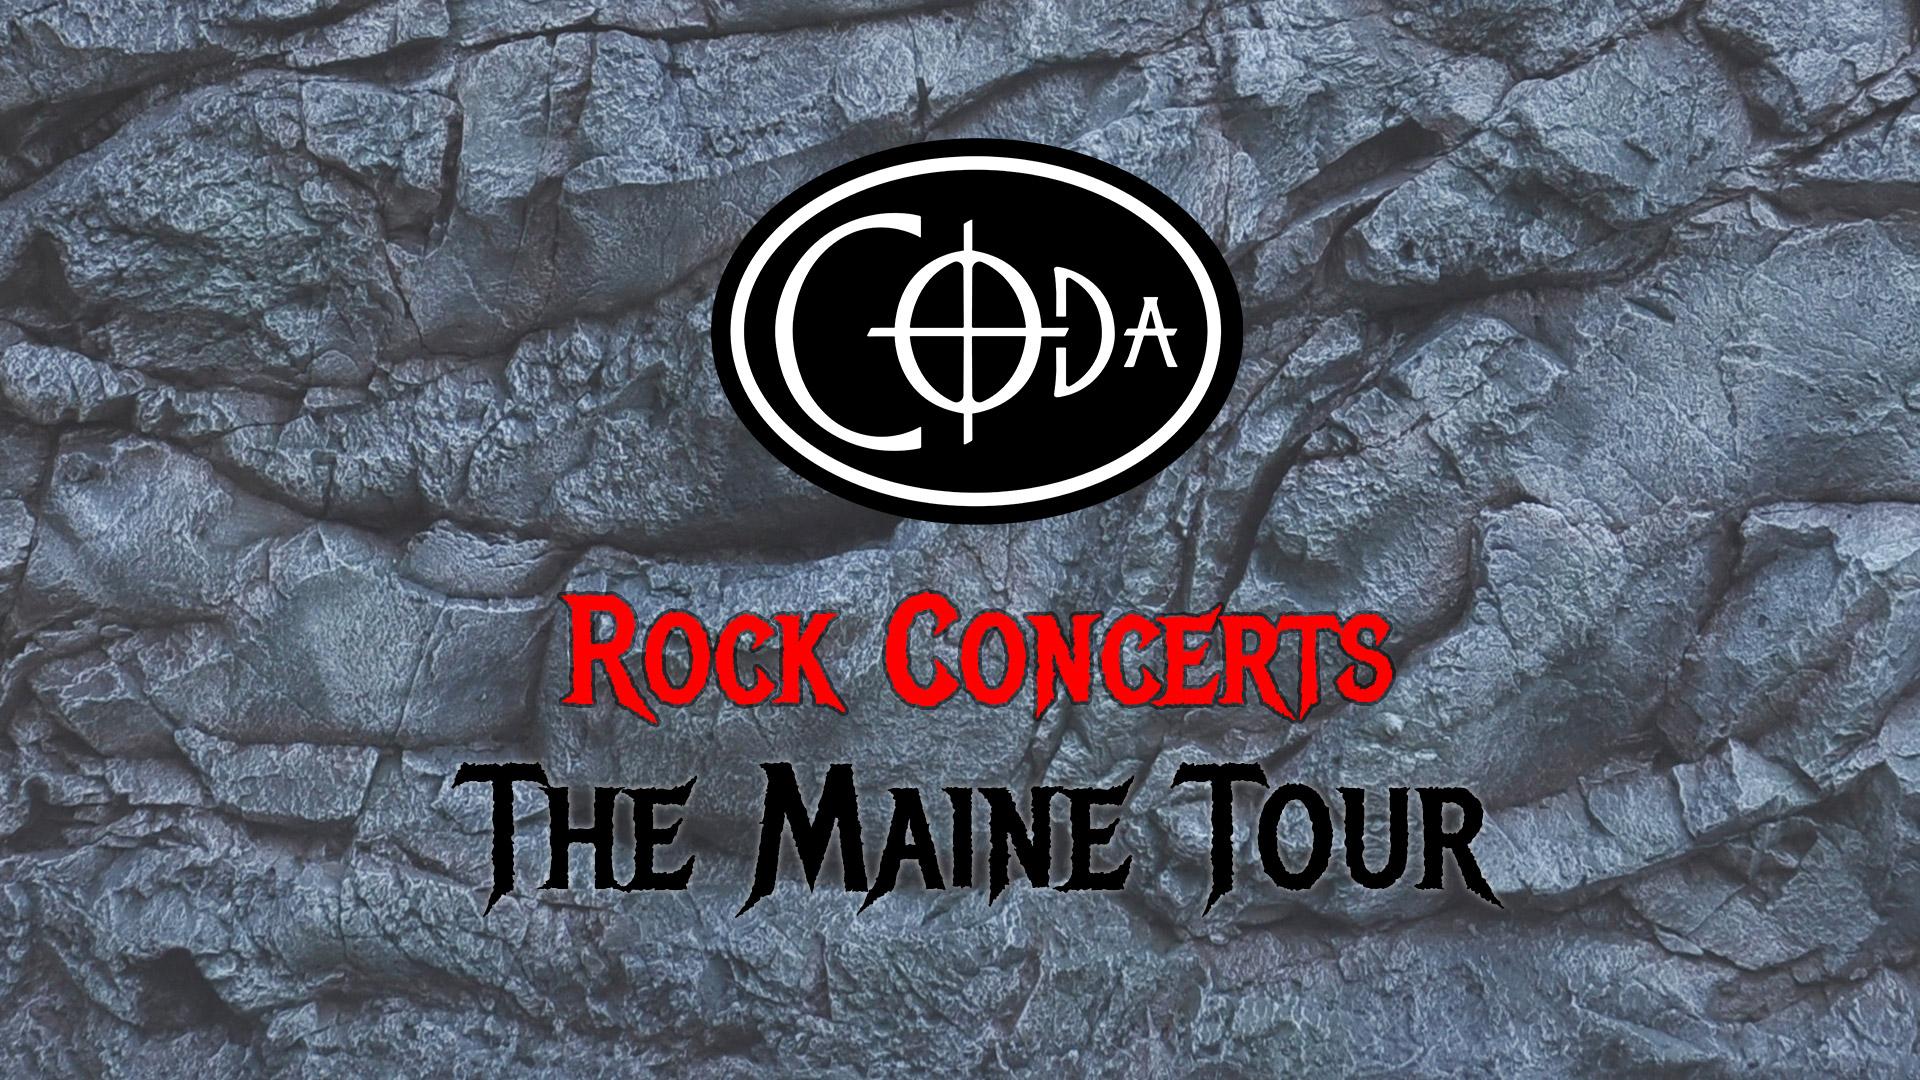 Coda Rock concert main slide